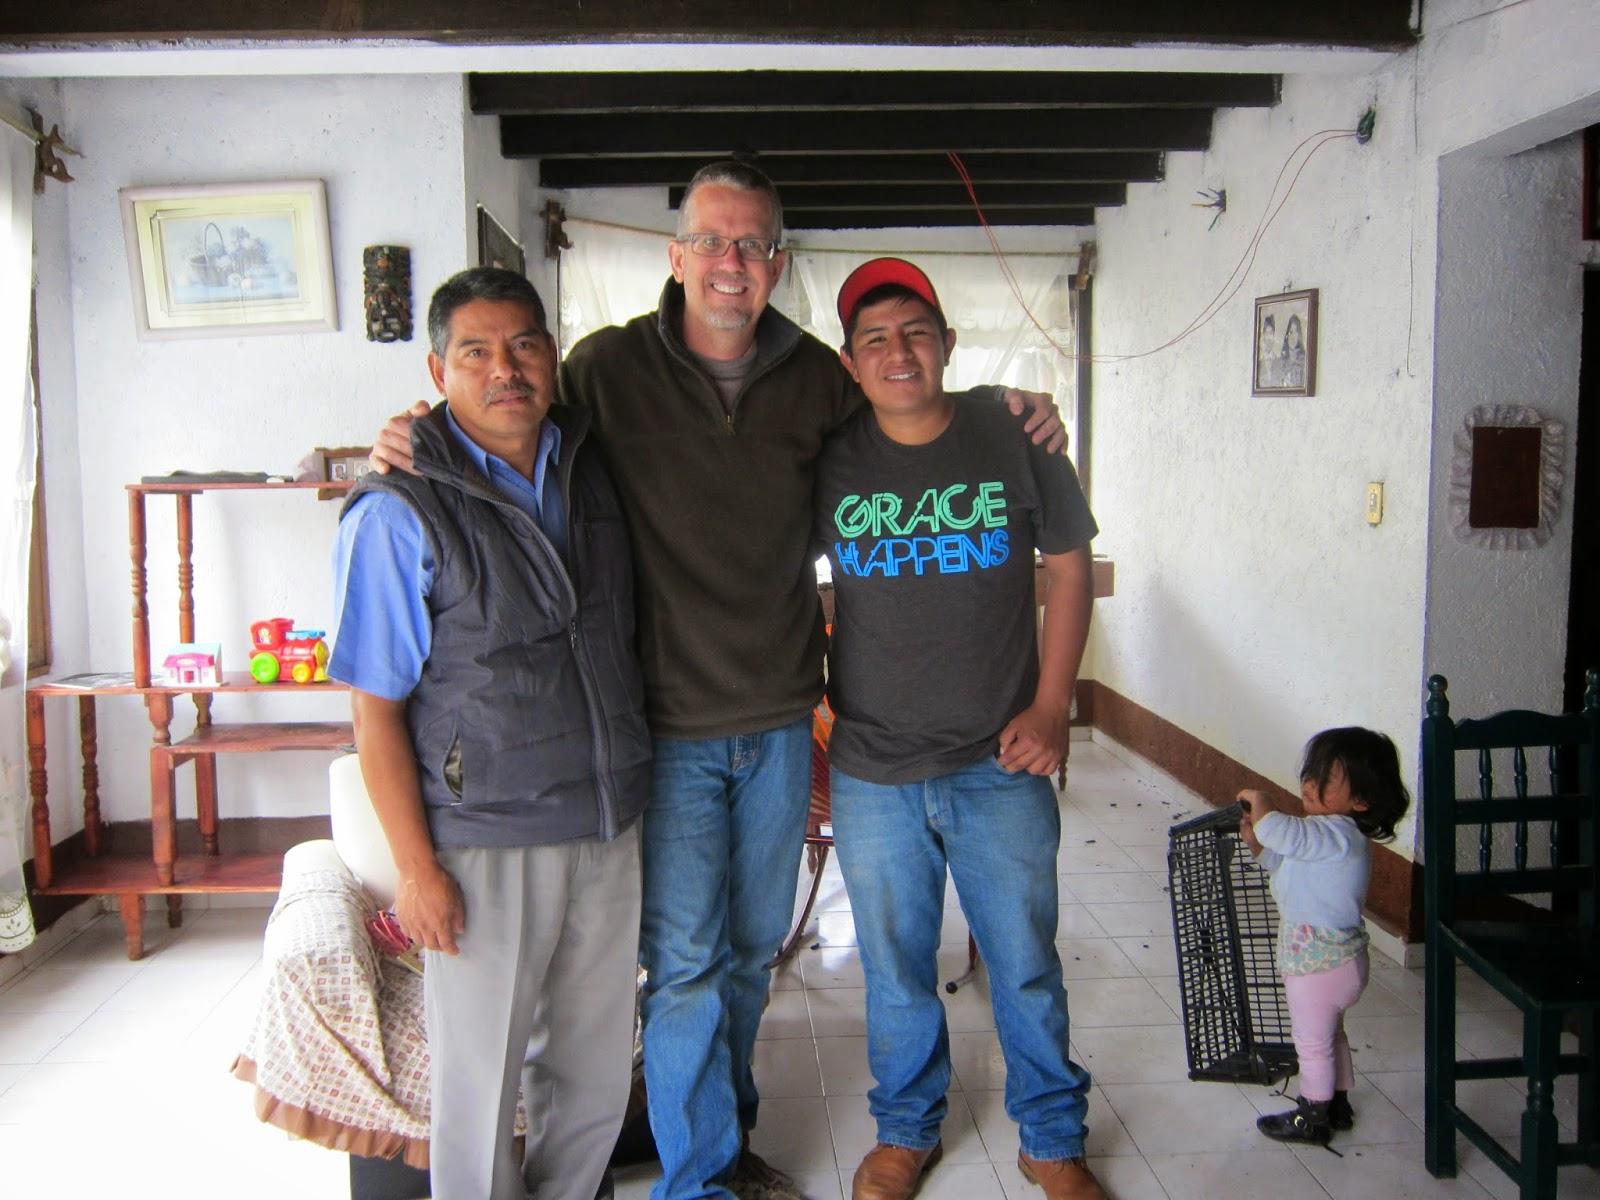 Eloxochitlan, Oaxaca, December 14, Violence, Dave Miller, Manuel Zepeda